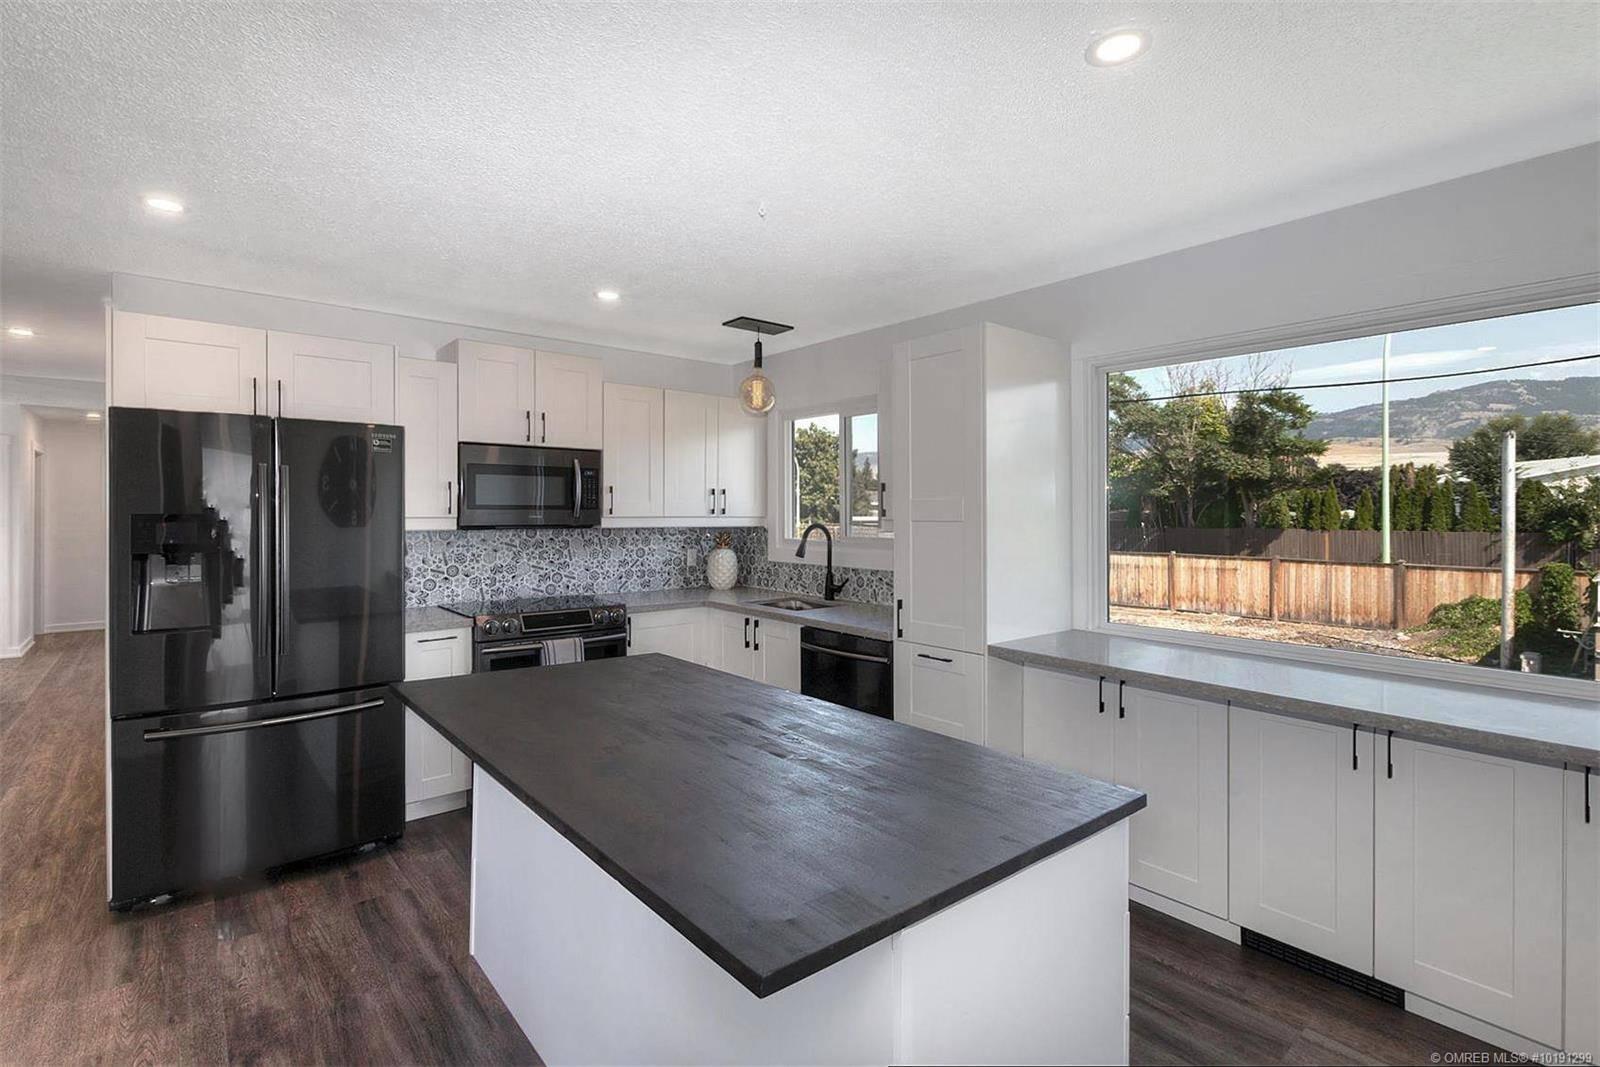 House for sale at 425 Vista Rd Kelowna British Columbia - MLS: 10191299